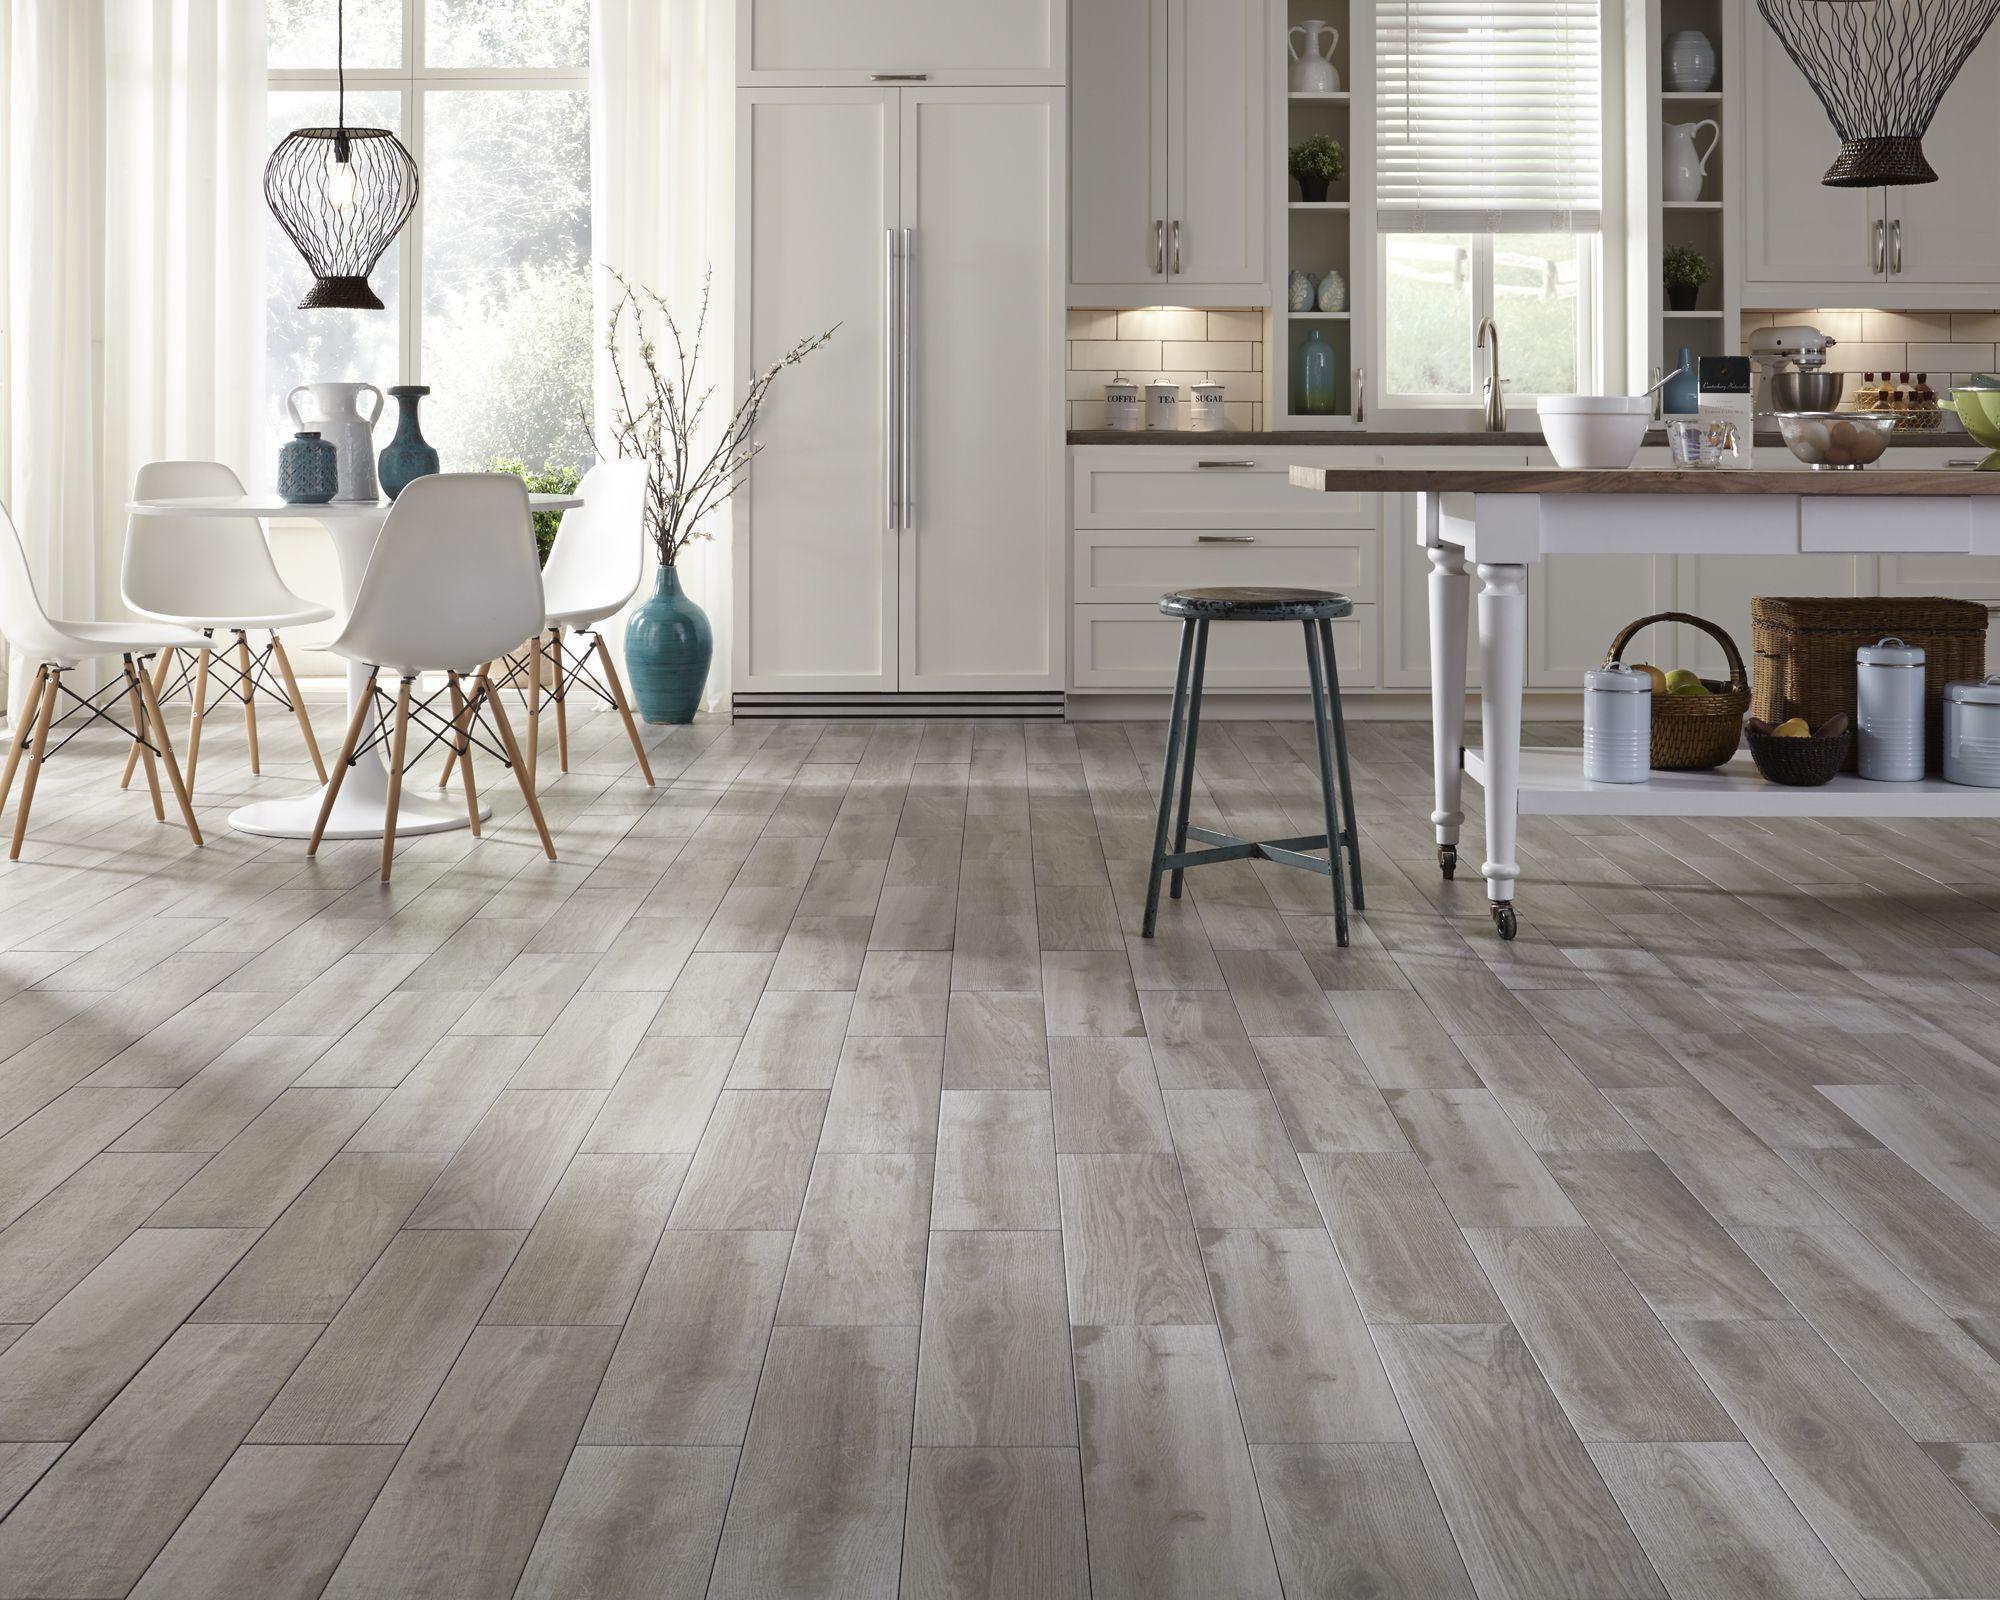 gray wood tile flooring